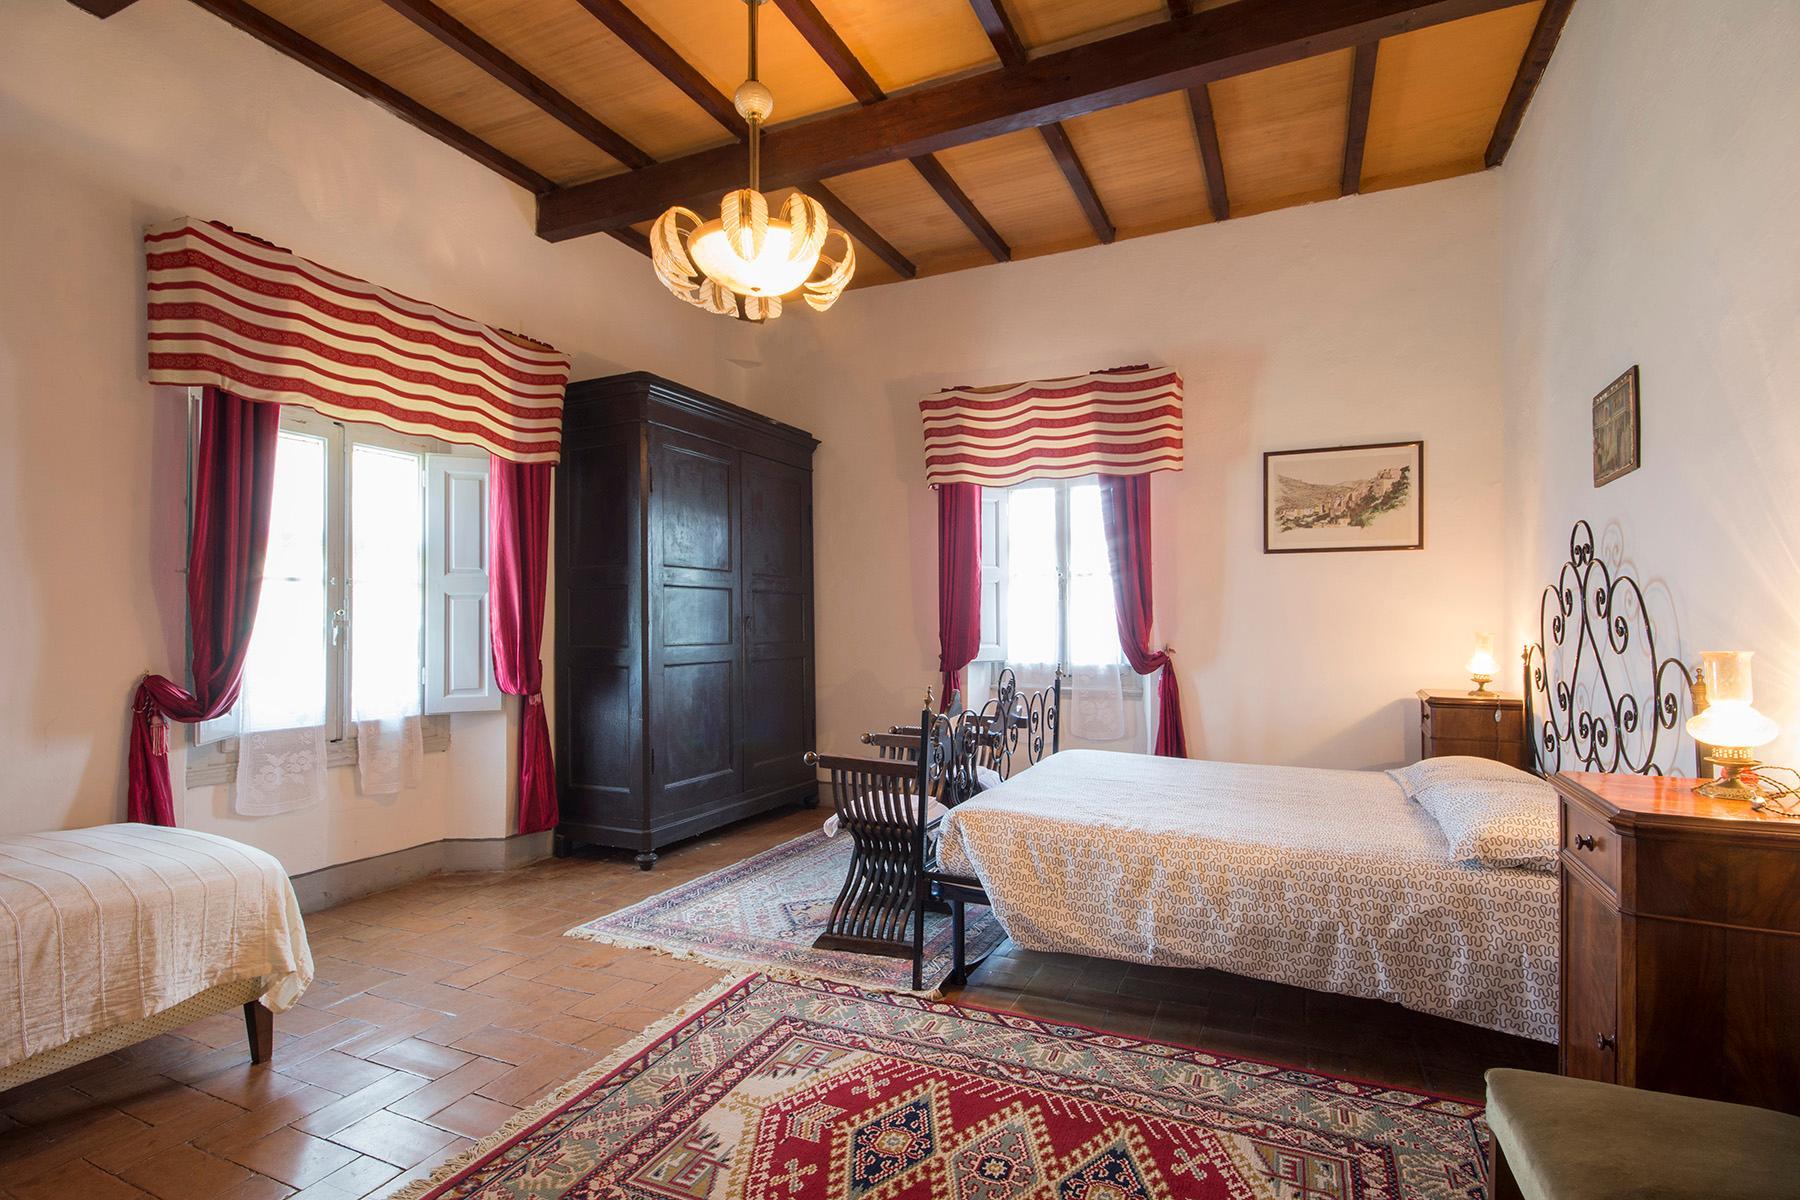 Villa charmante dans dans la Val di Sieve - 15